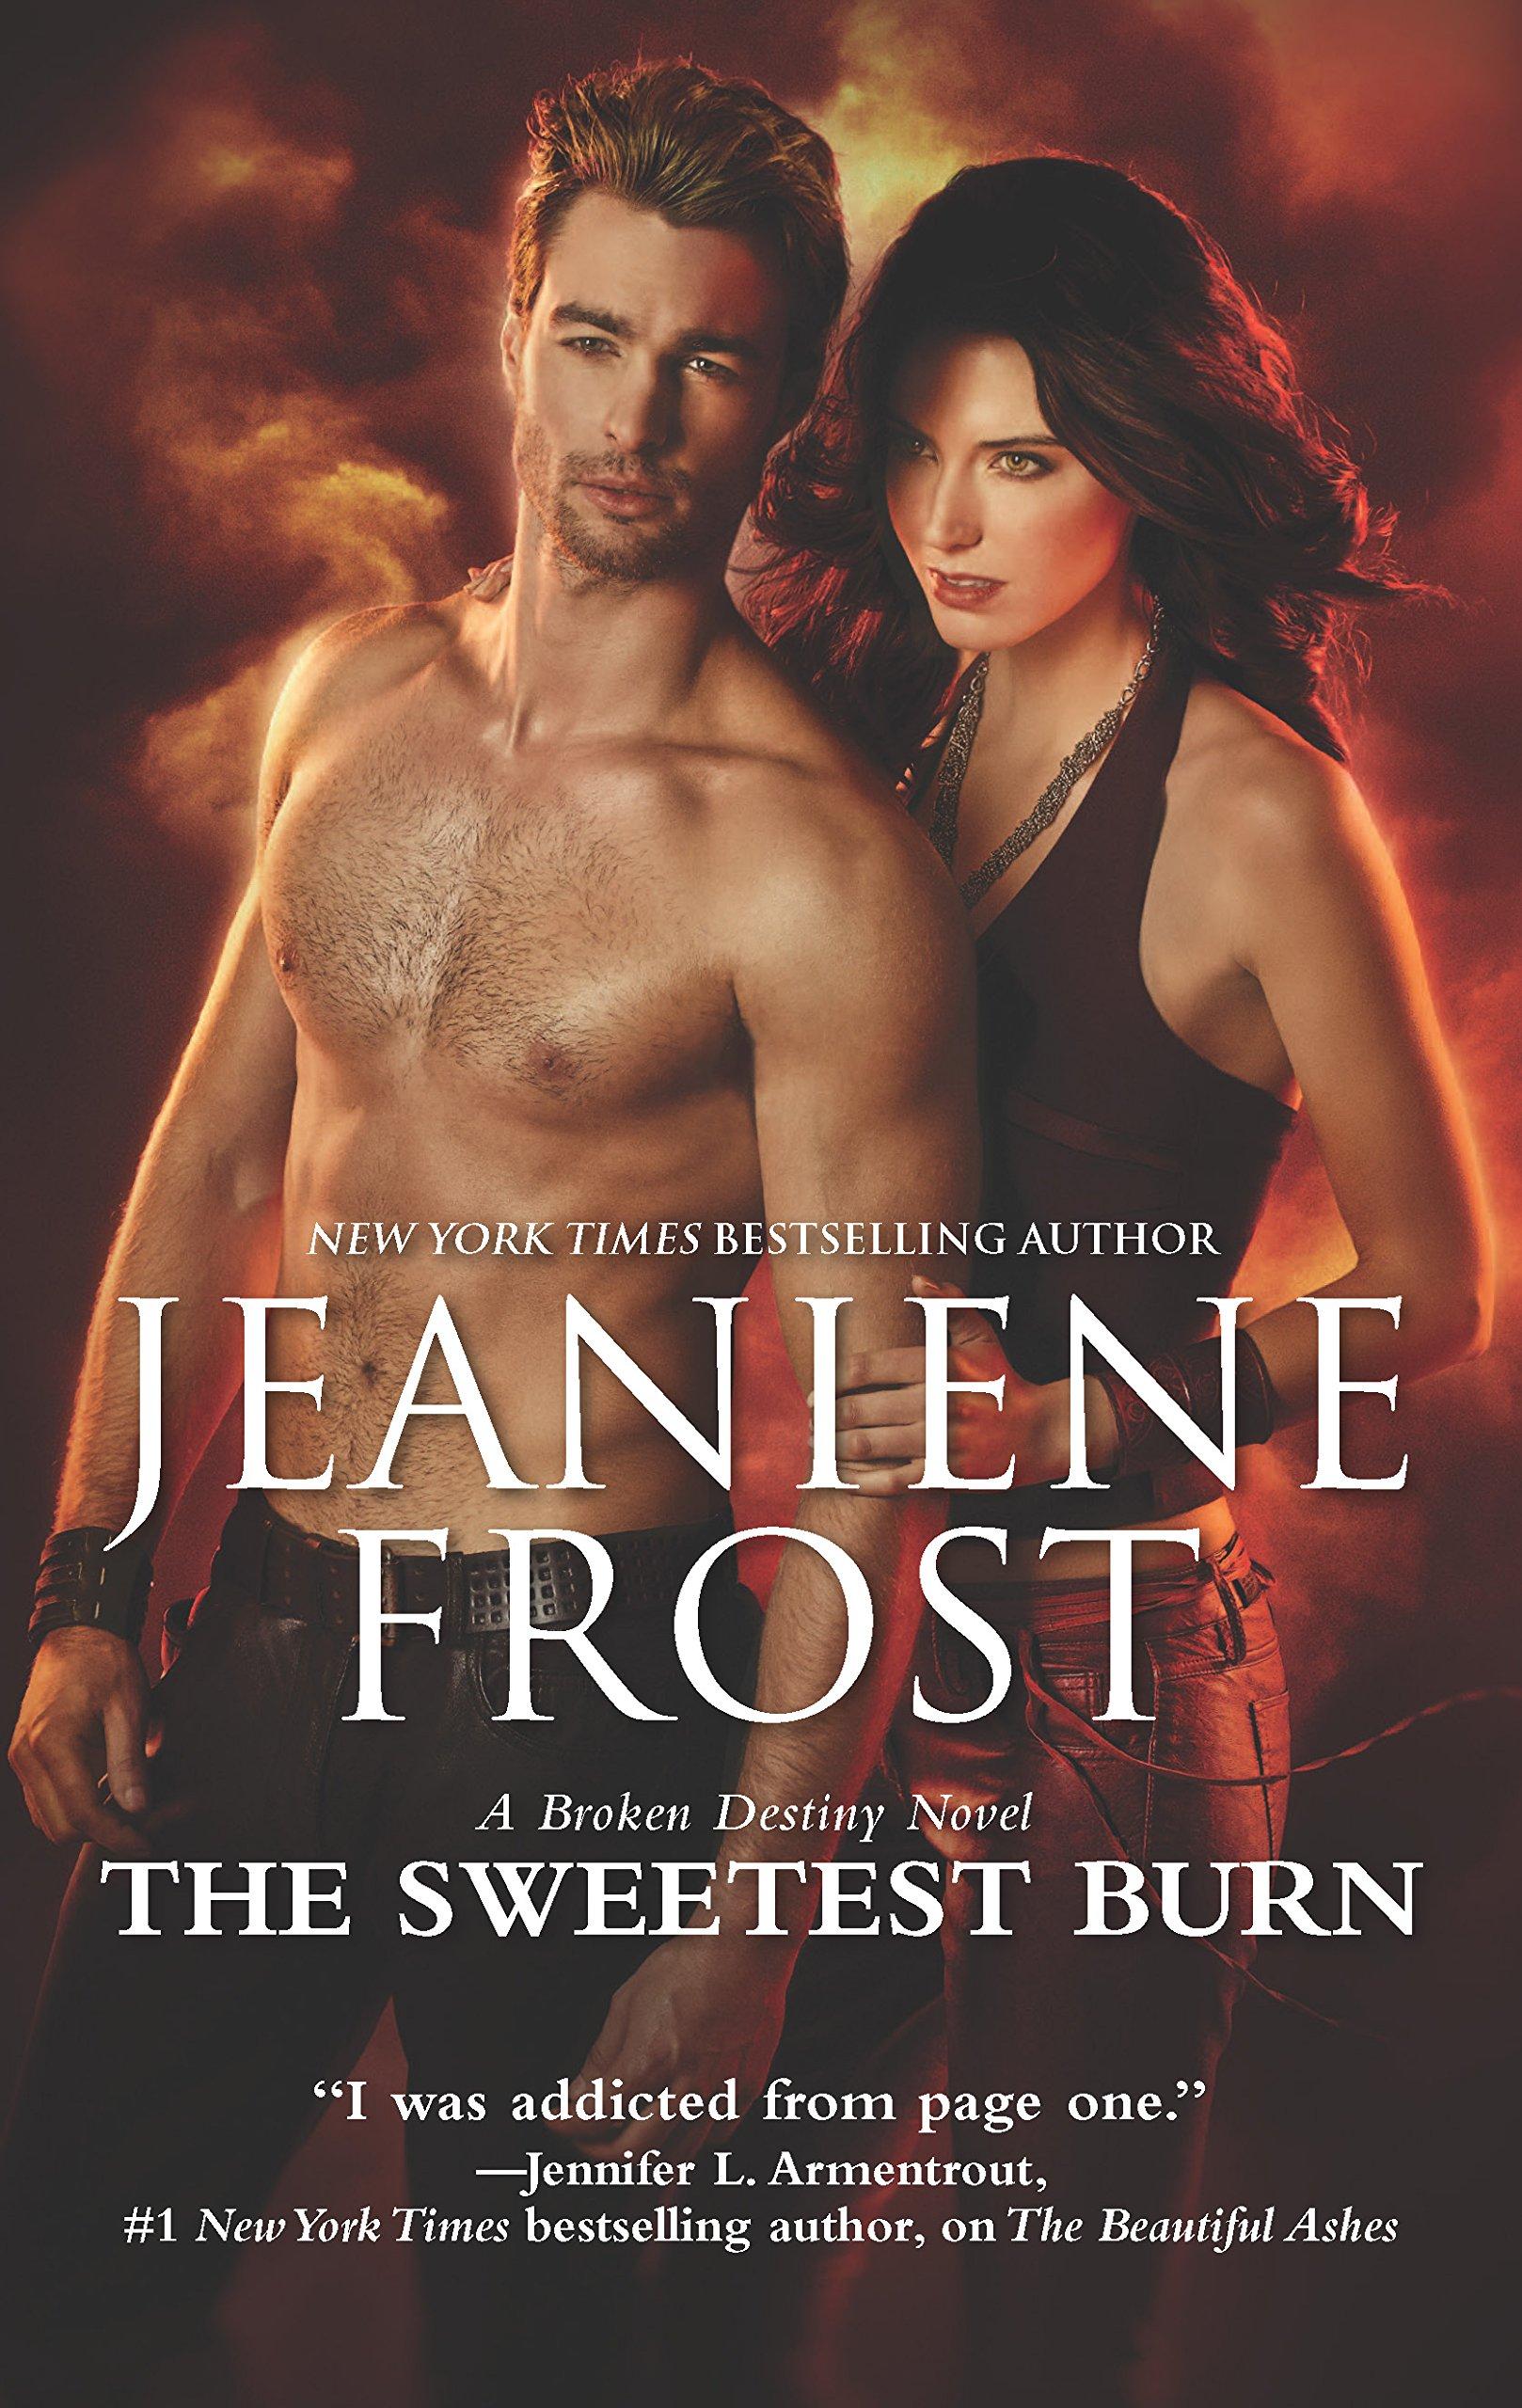 The Sweetest Burn: A Paranormal Romance Novel (A Broken Destiny Novel) PDF